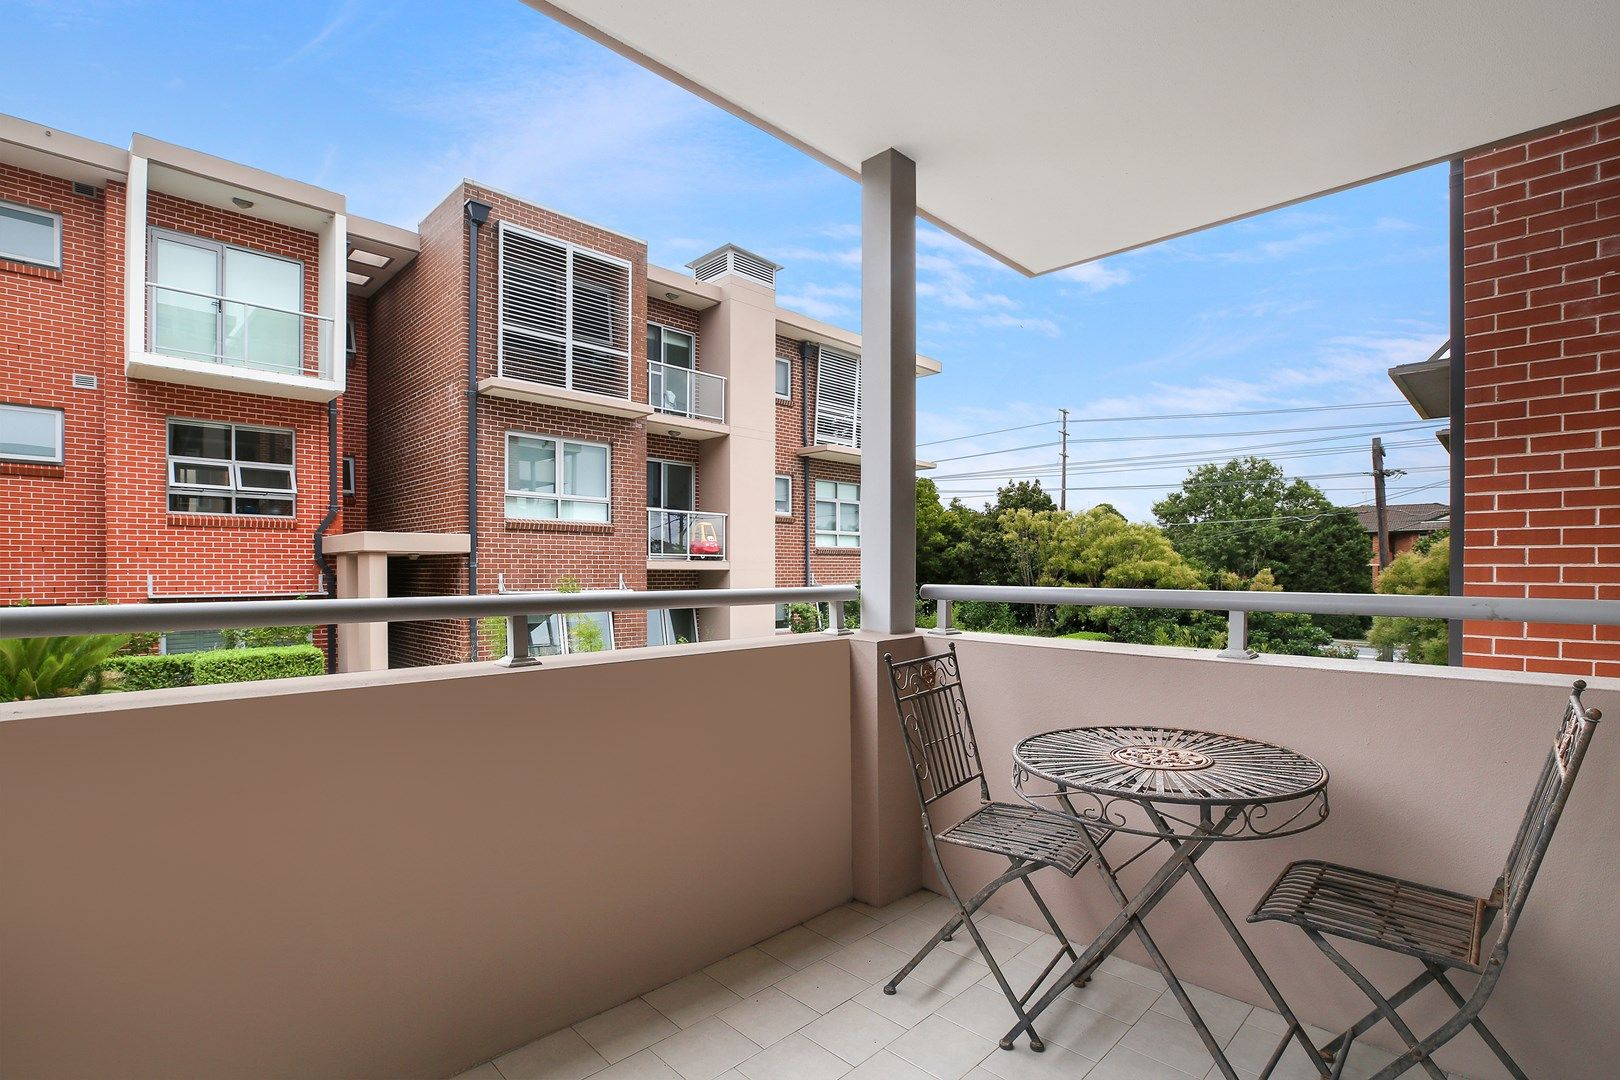 27/500 President Avenue, Sutherland NSW 2232, Image 0